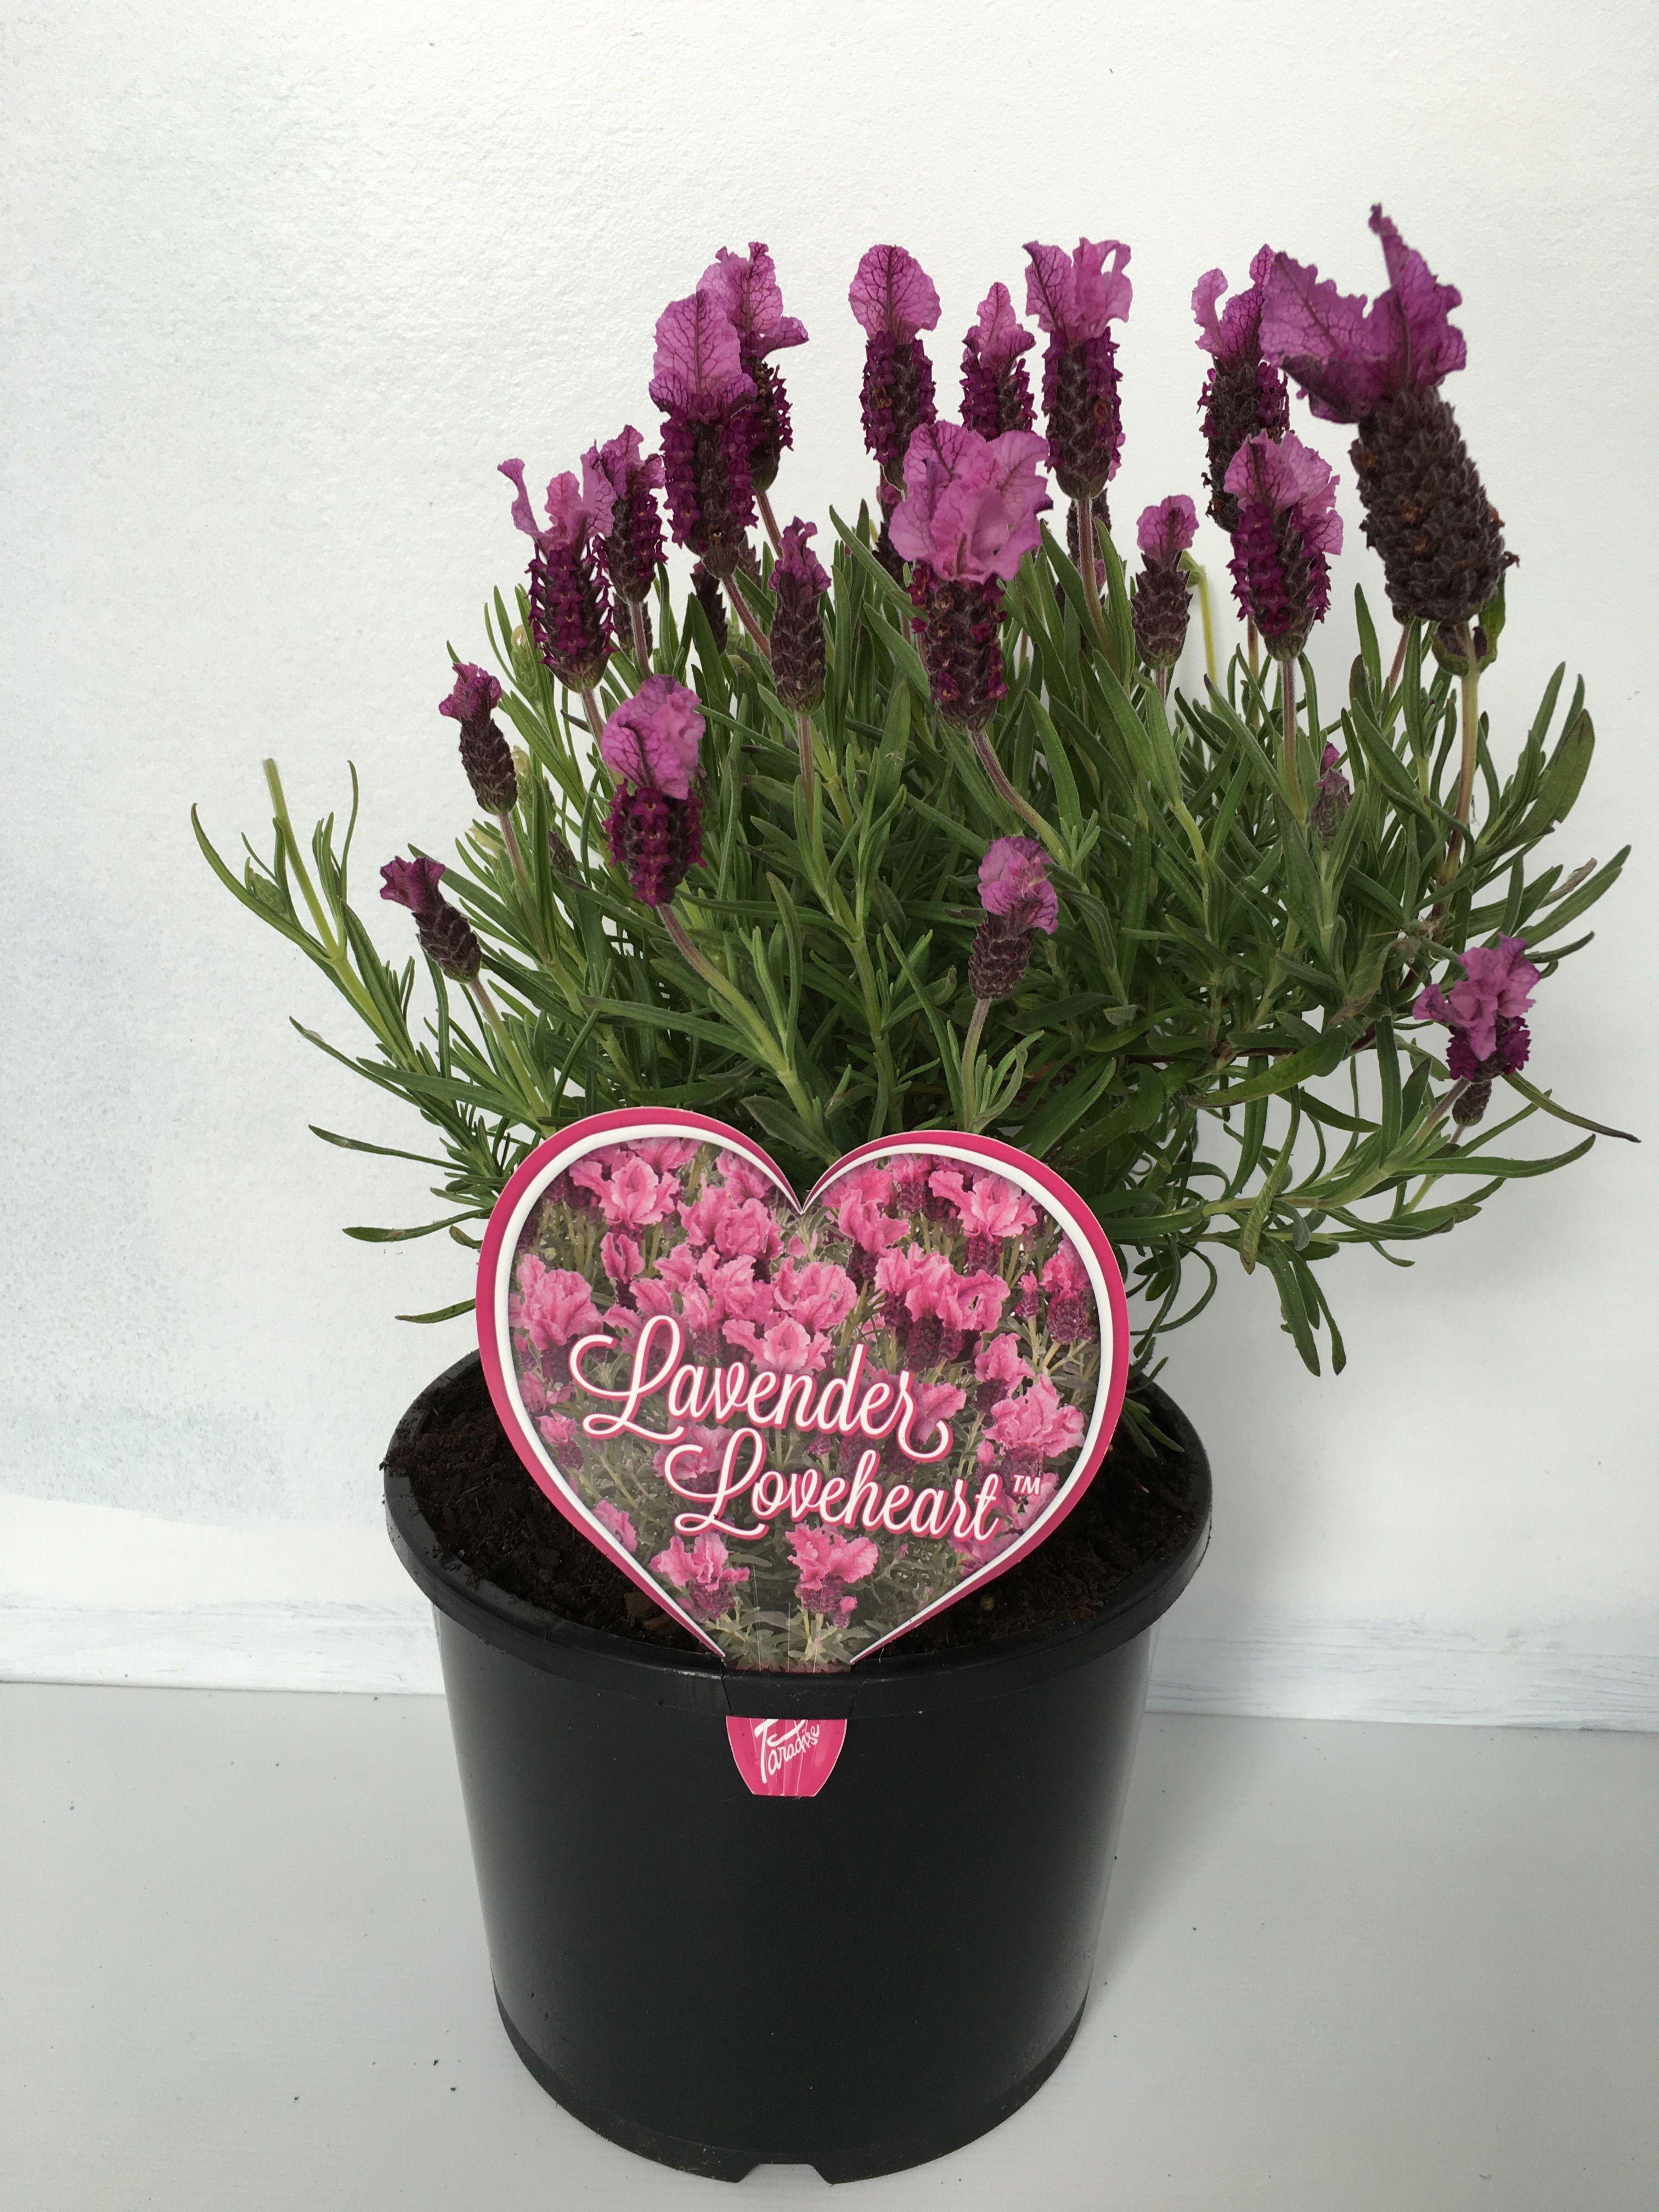 Lavender Loveheart Image.jpg